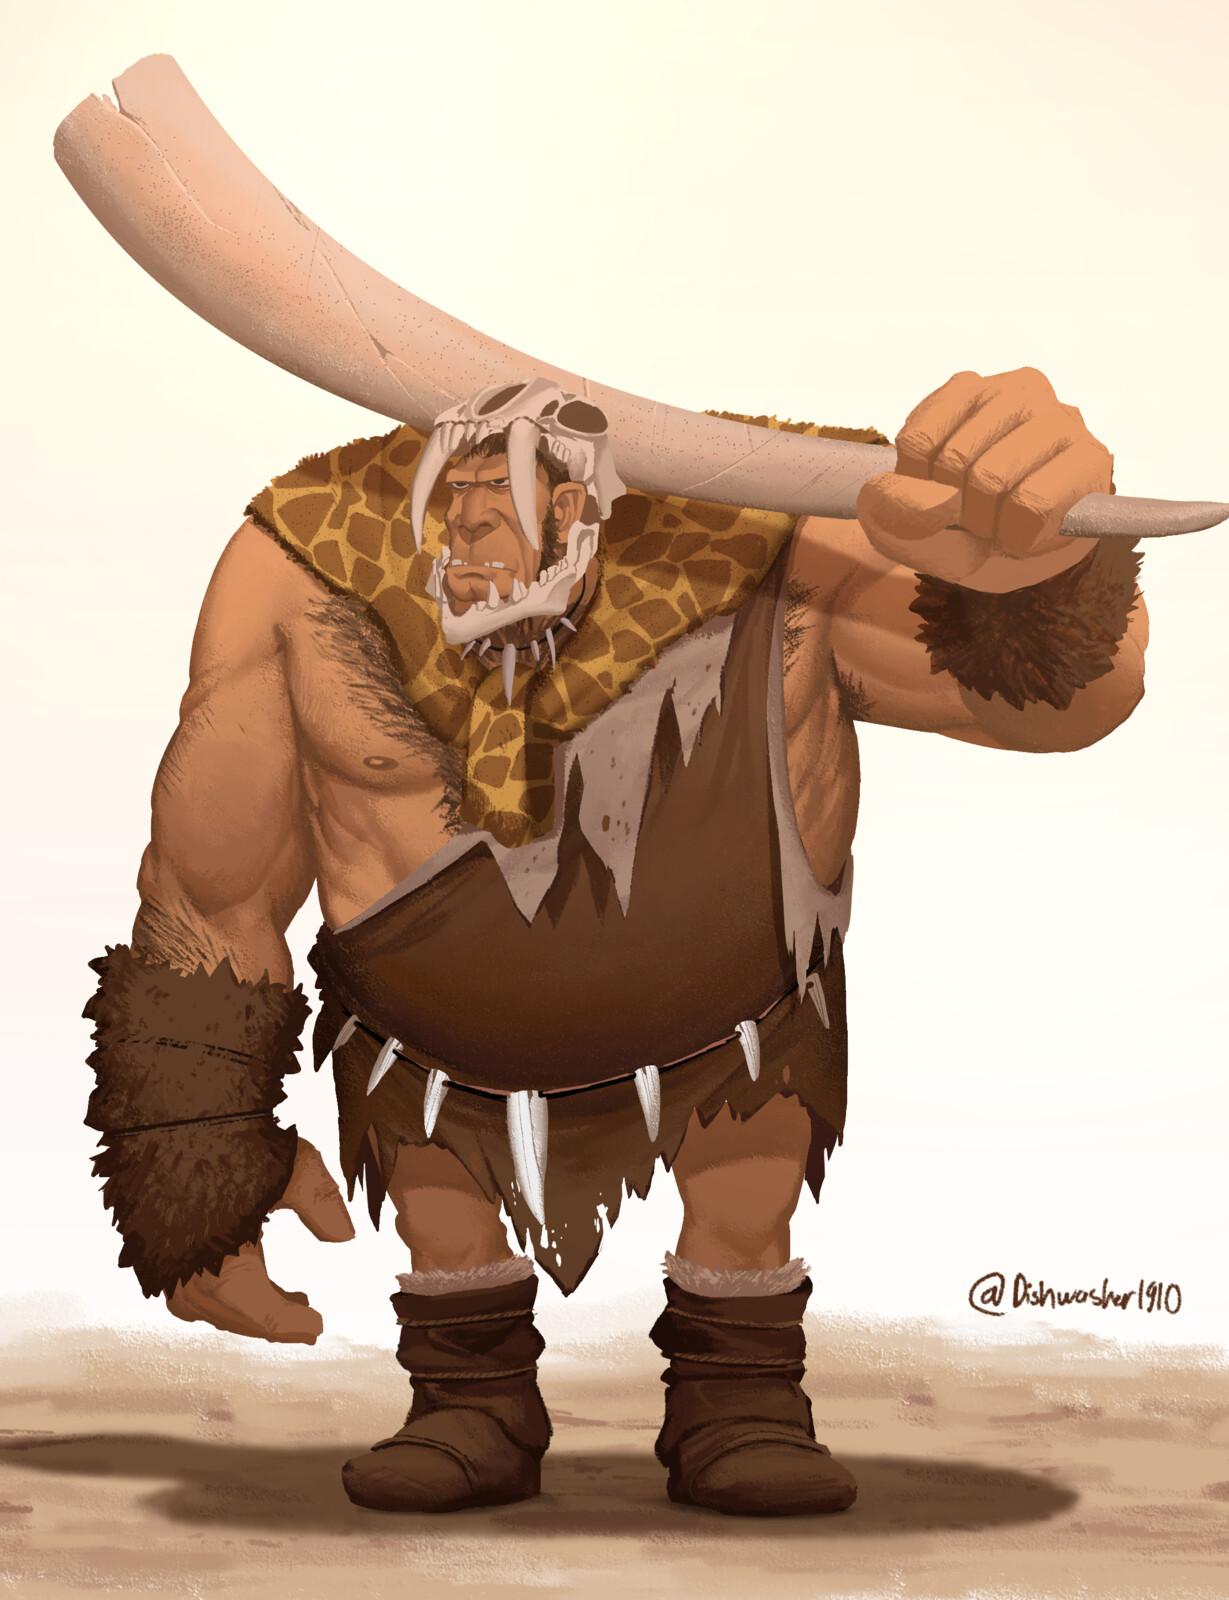 CDC Caveman challenge